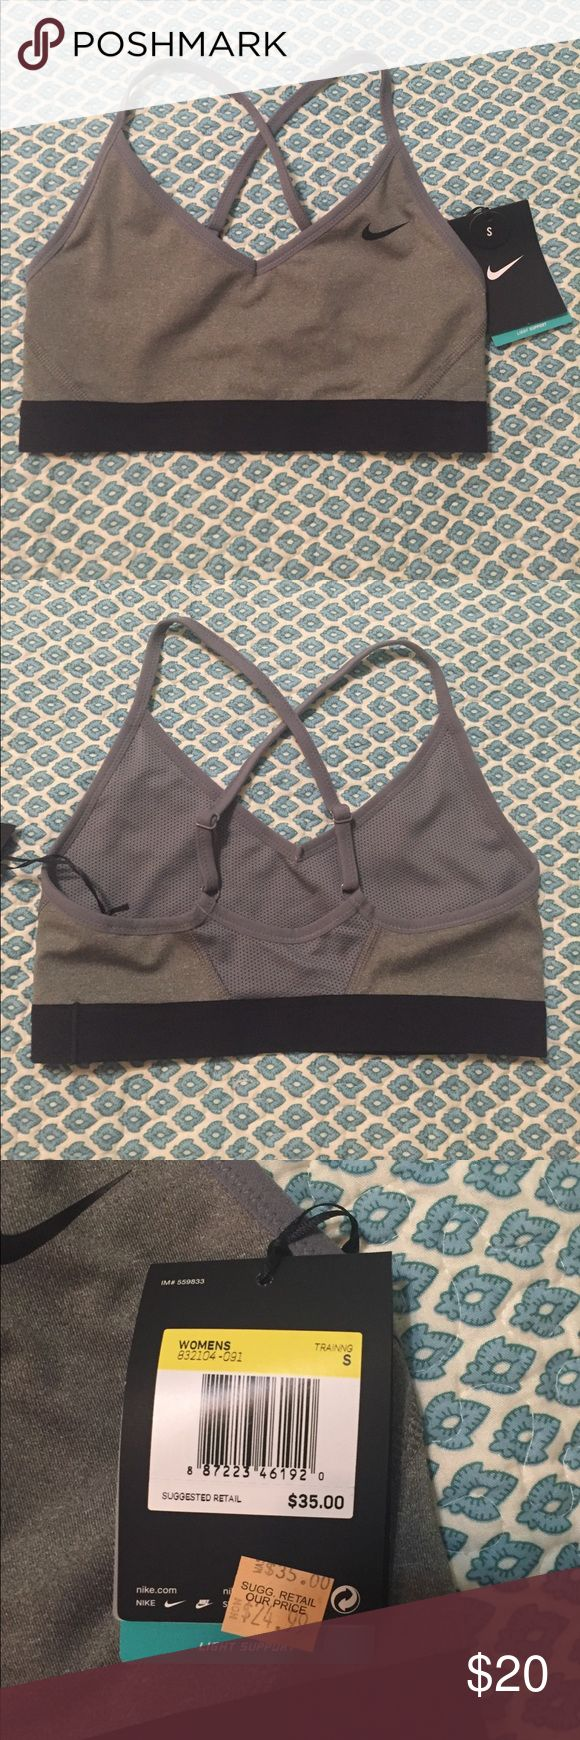 Nike sports bra Nike Sports Bra light support size small Nike Intimates & Sleepwear Bras